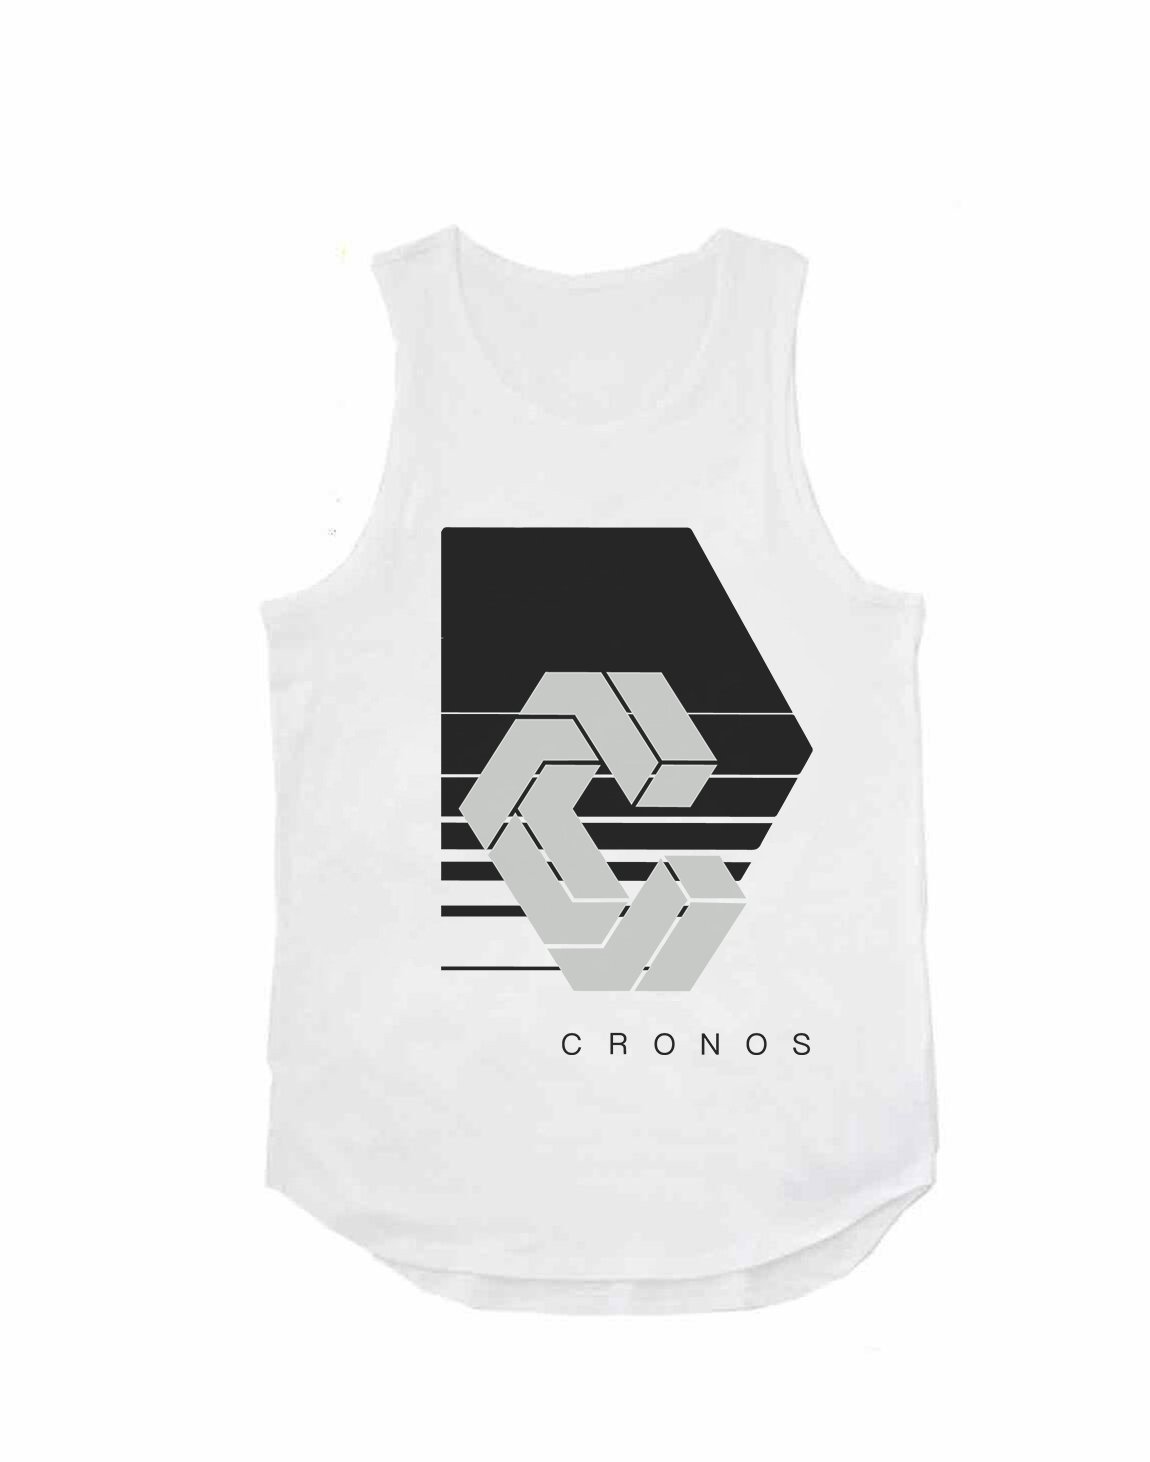 CRONOS REFLECTION LOGO TANK TOP【WHITE】